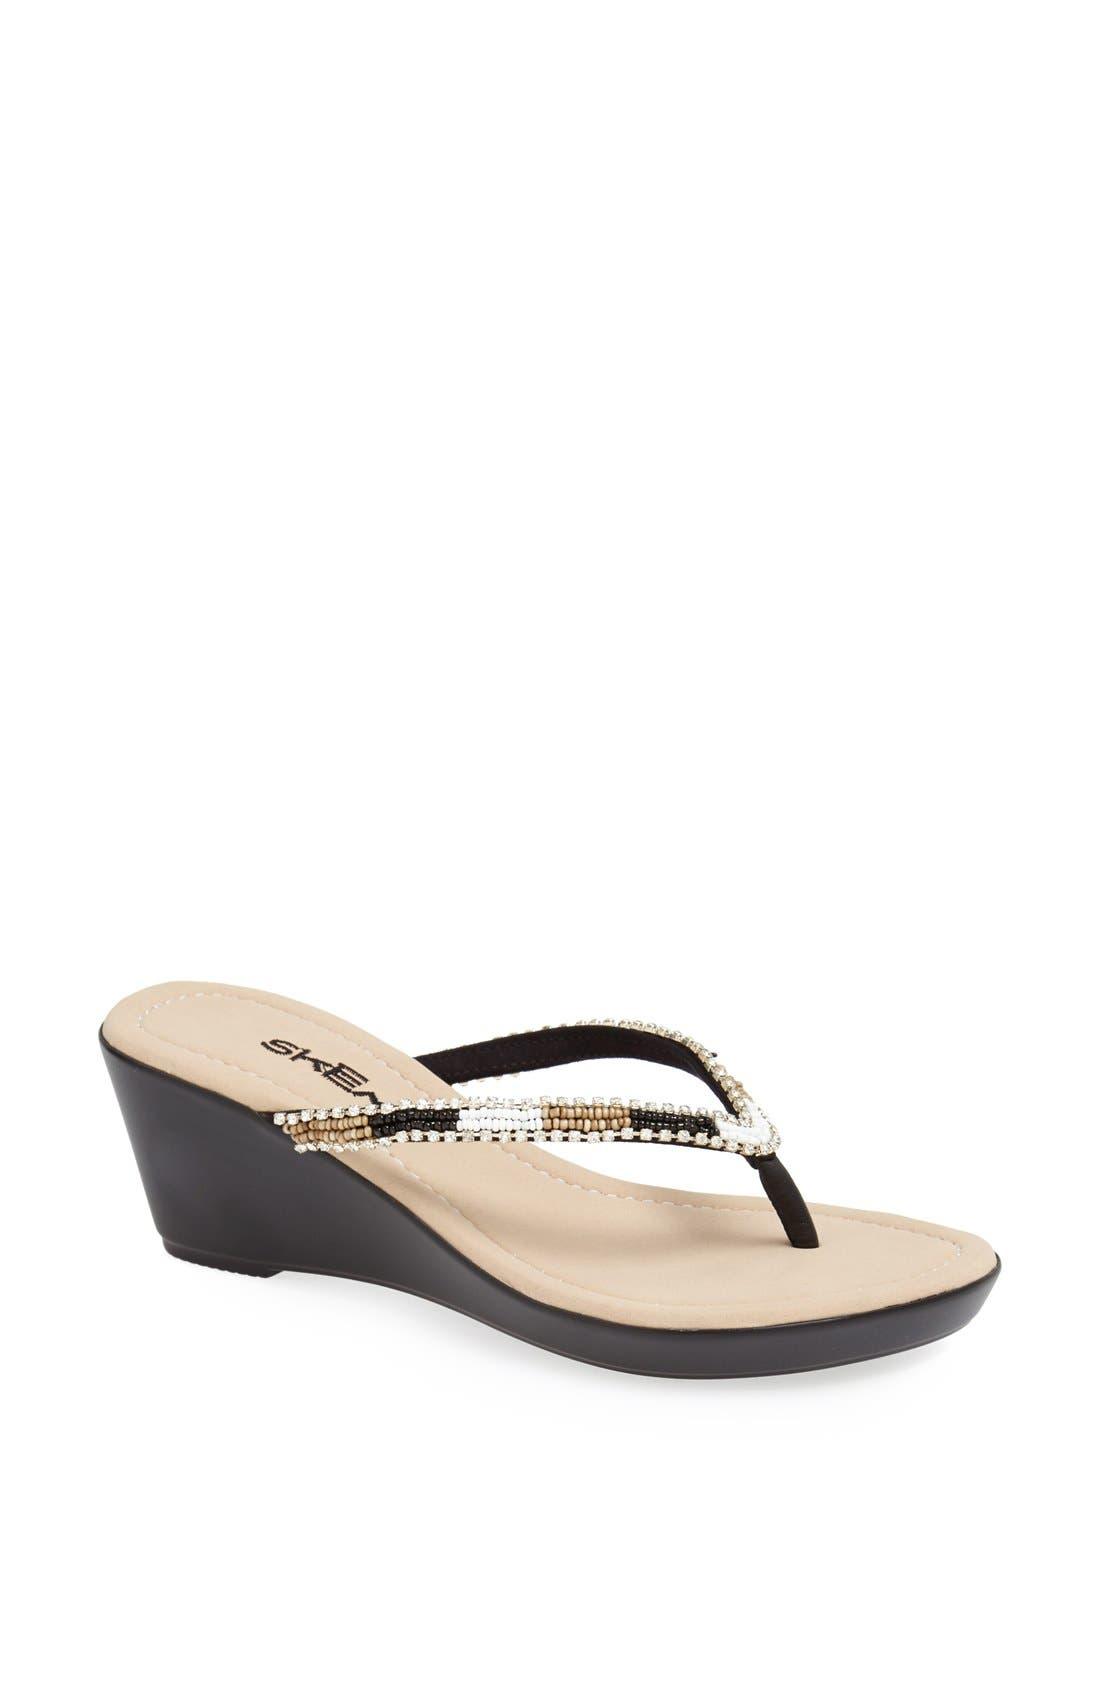 Main Image - Skemo 'Safi' Sandal